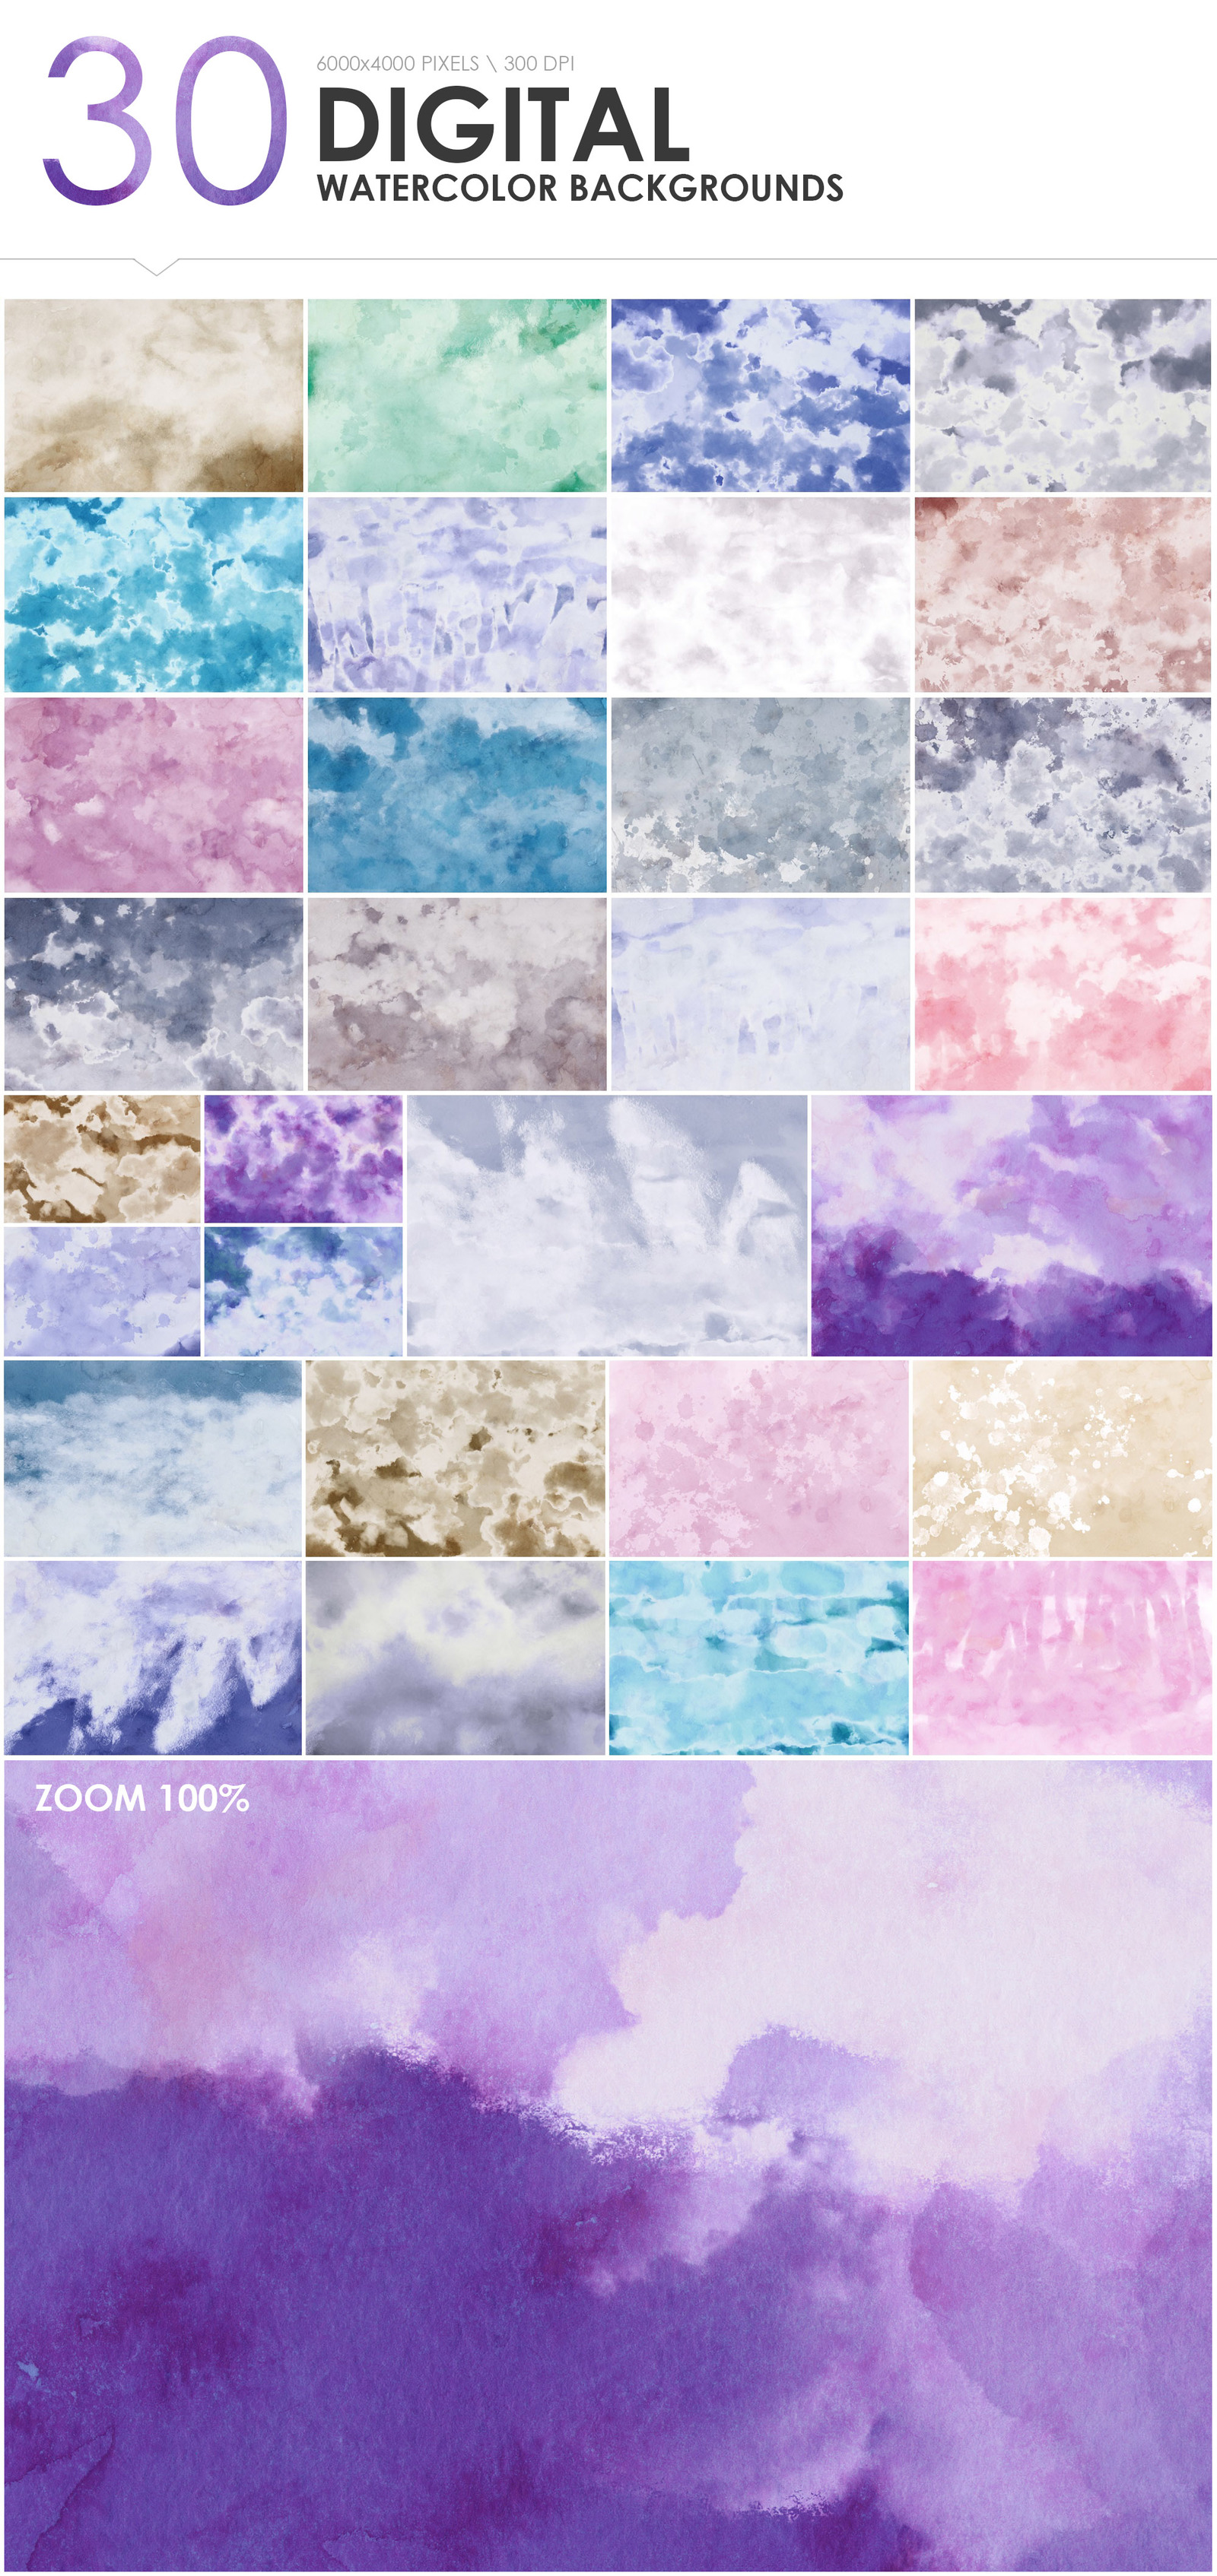 300 Diverse Watercolor Backgrounds